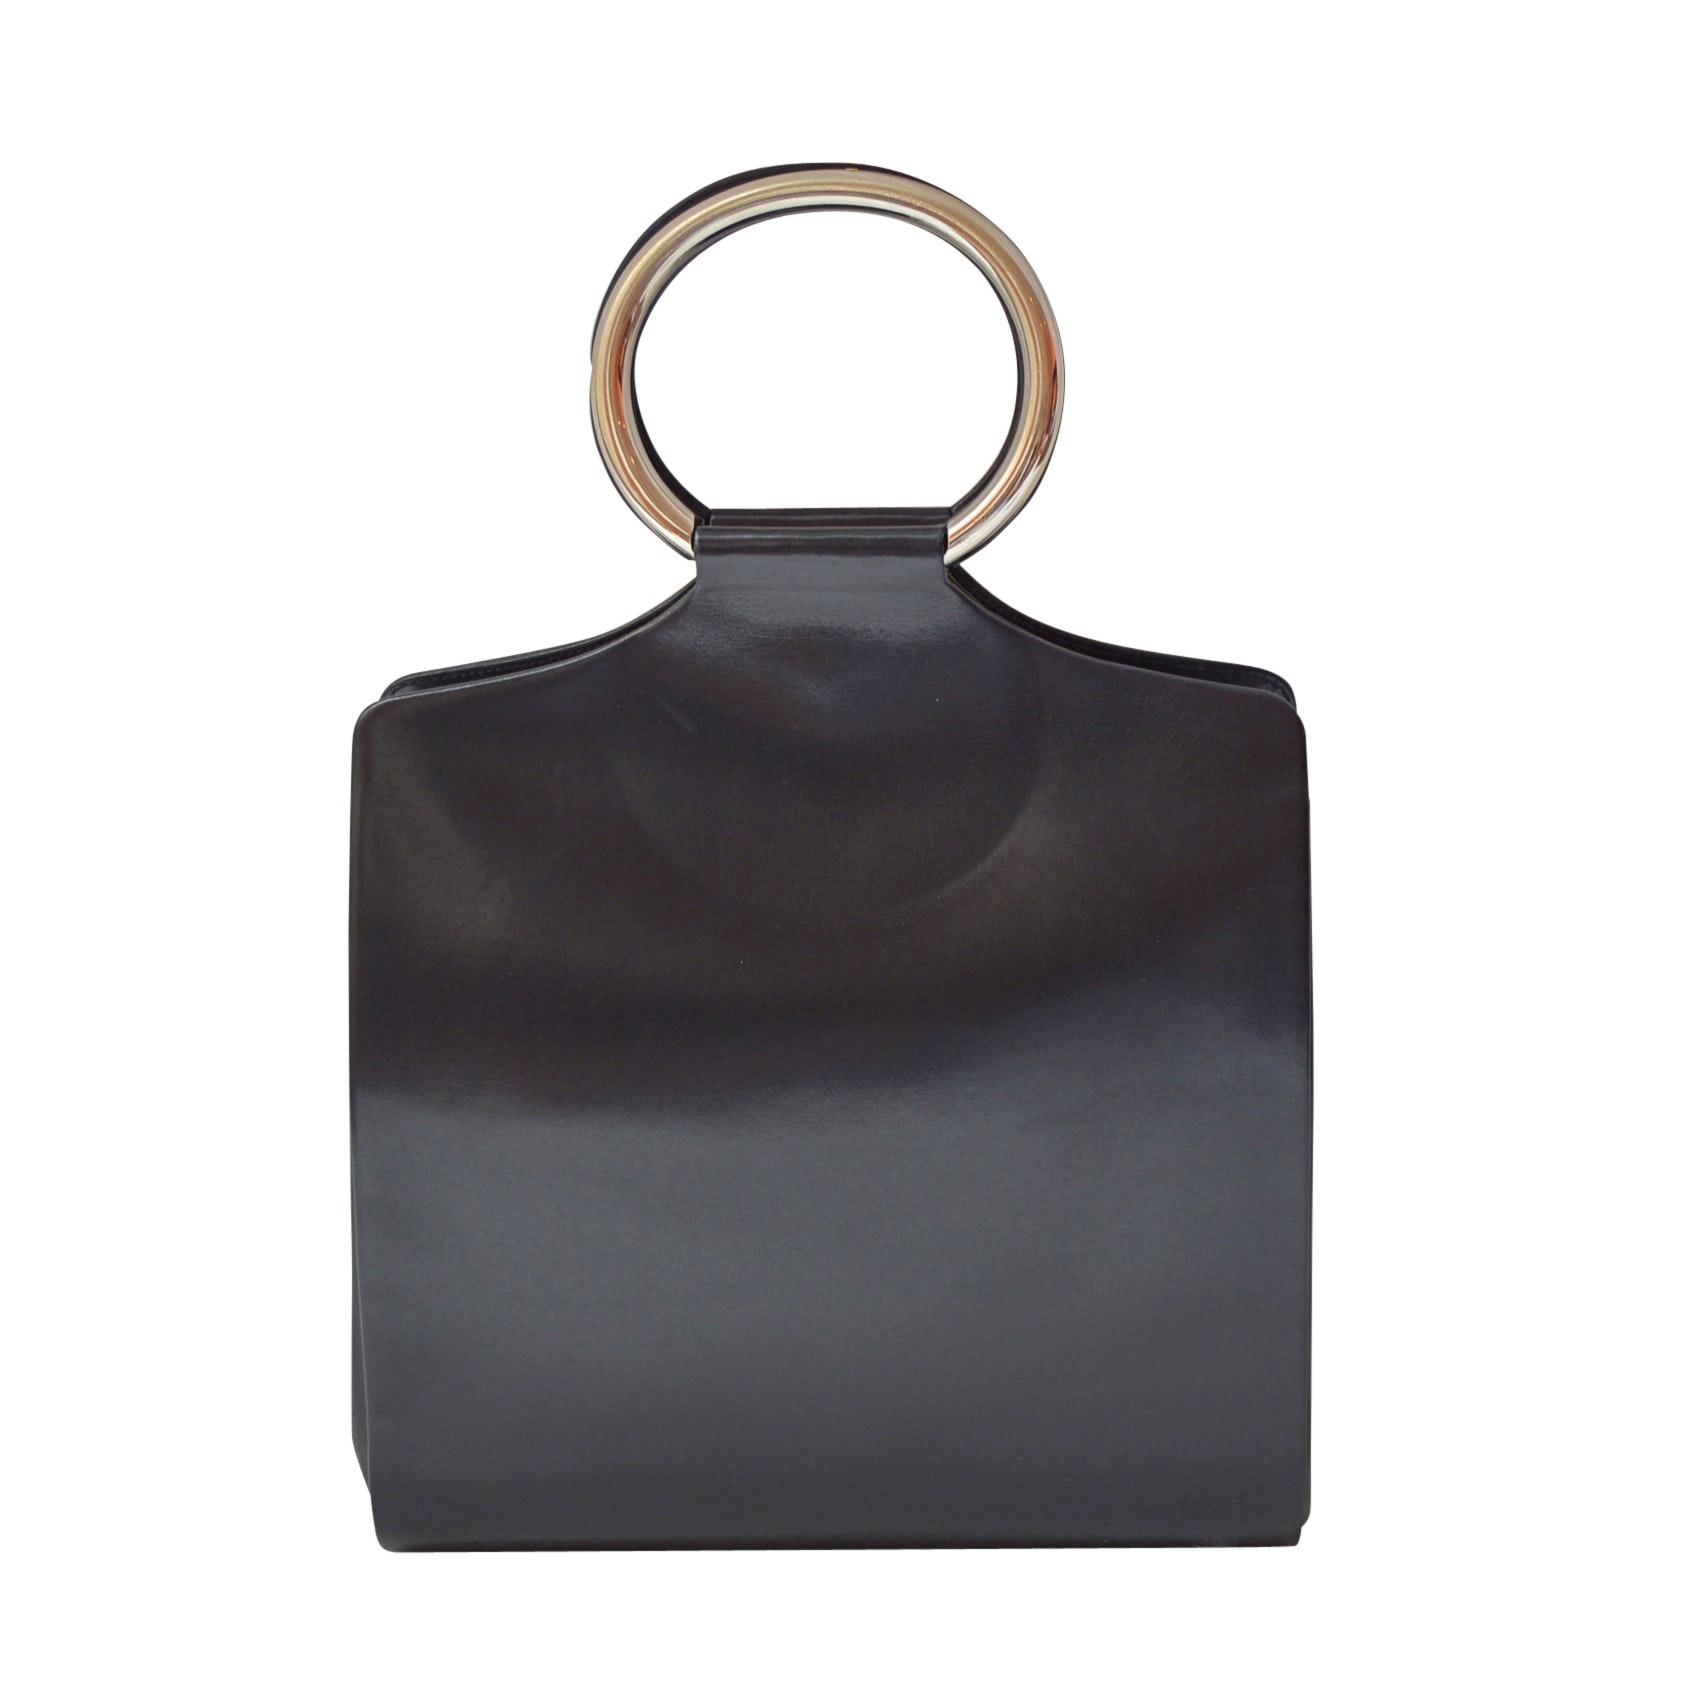 Rodo Italian Black Leather Handbag